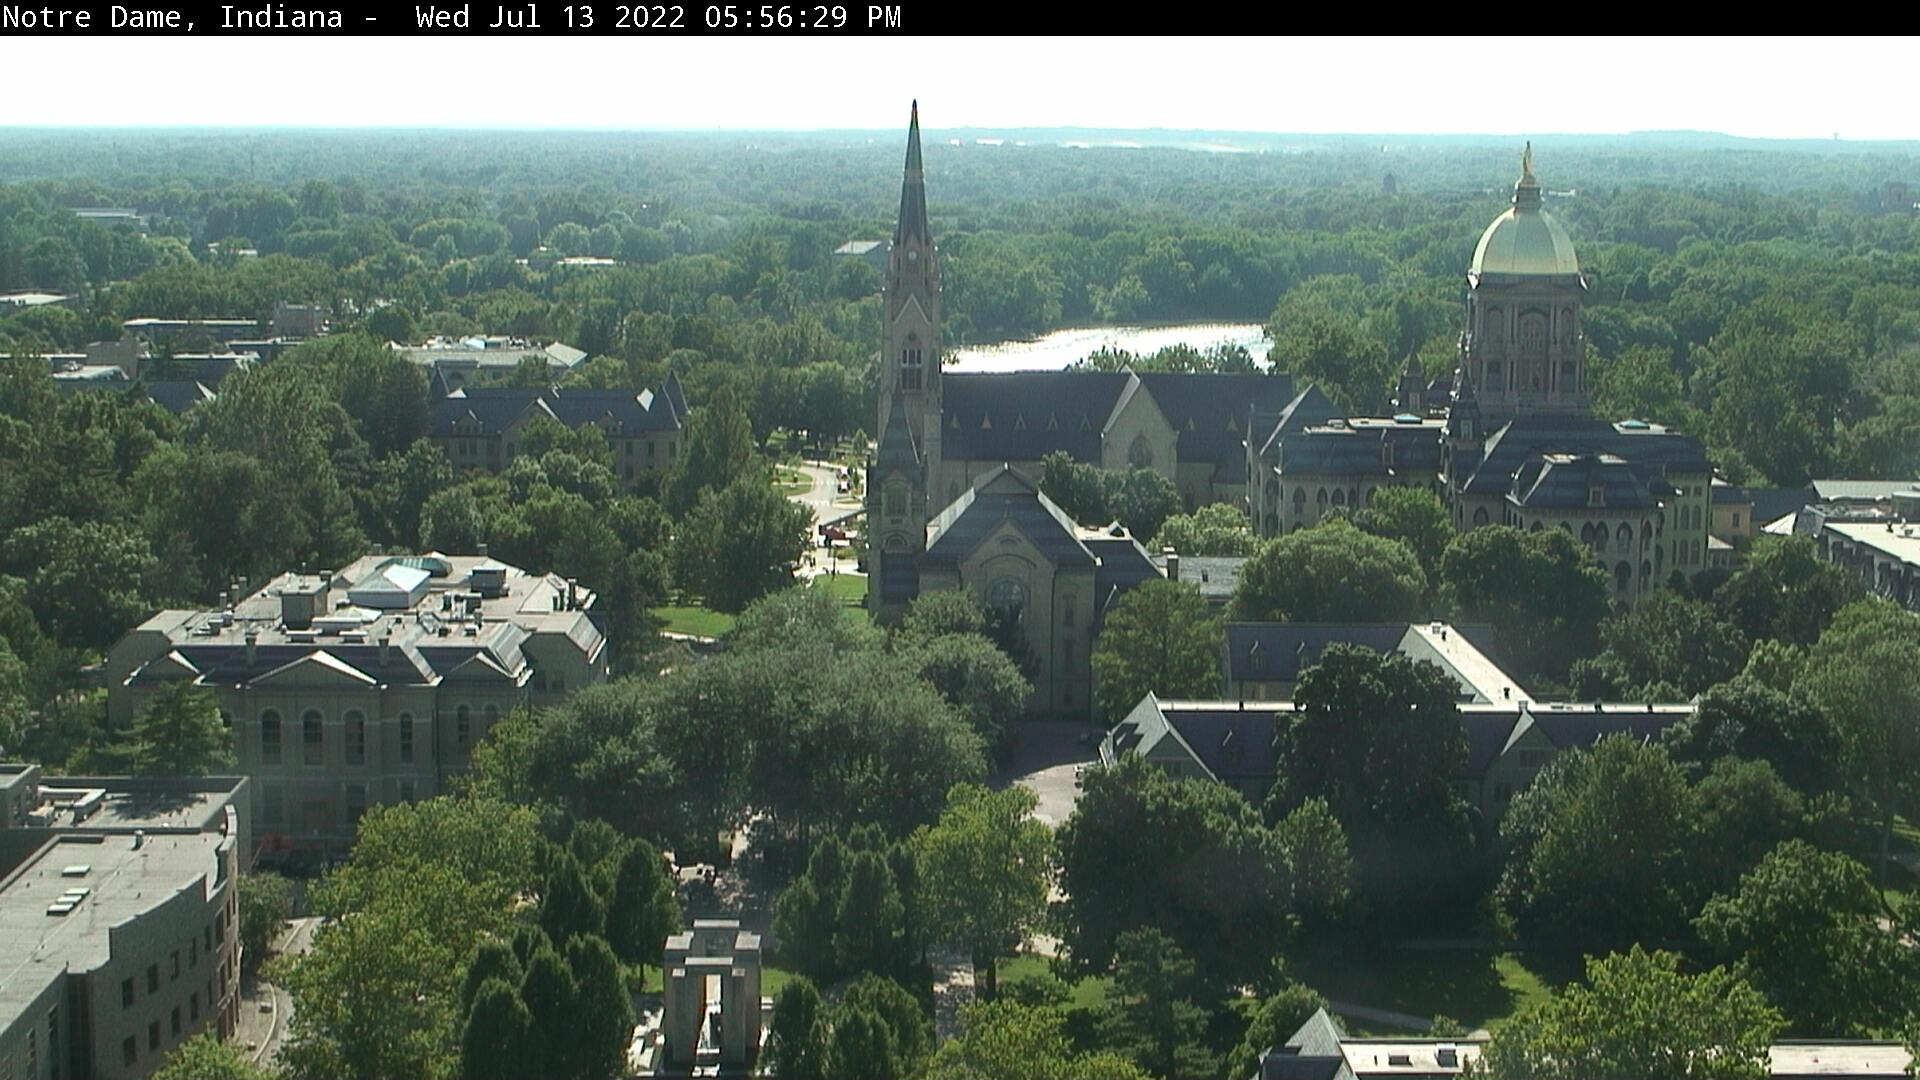 Notre Dame, Indiana Sat. 17:56